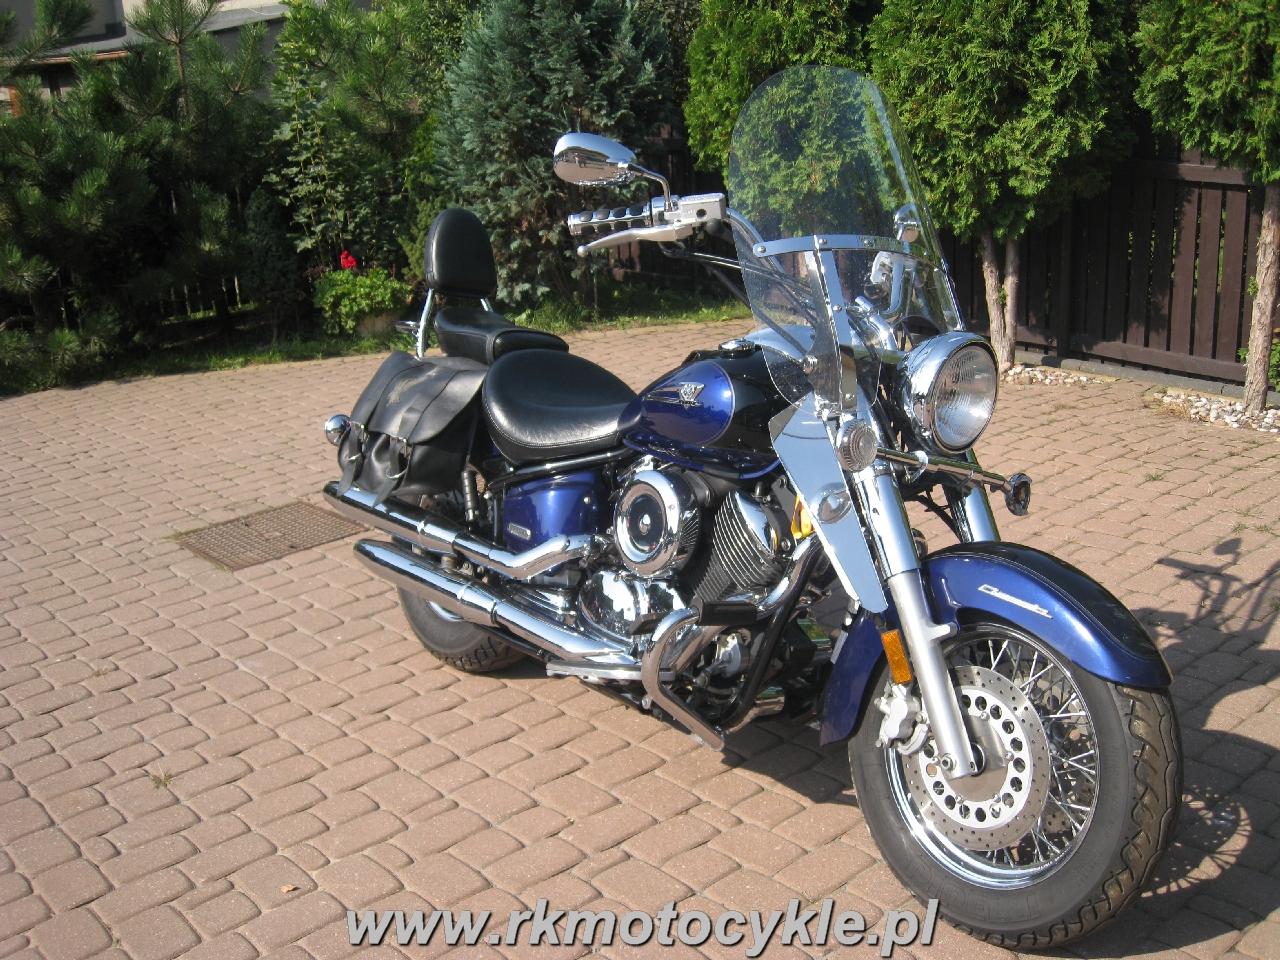 Rk Motocykle Yamaha Xvs 1100 Classic Drag Star Xvs1100 V